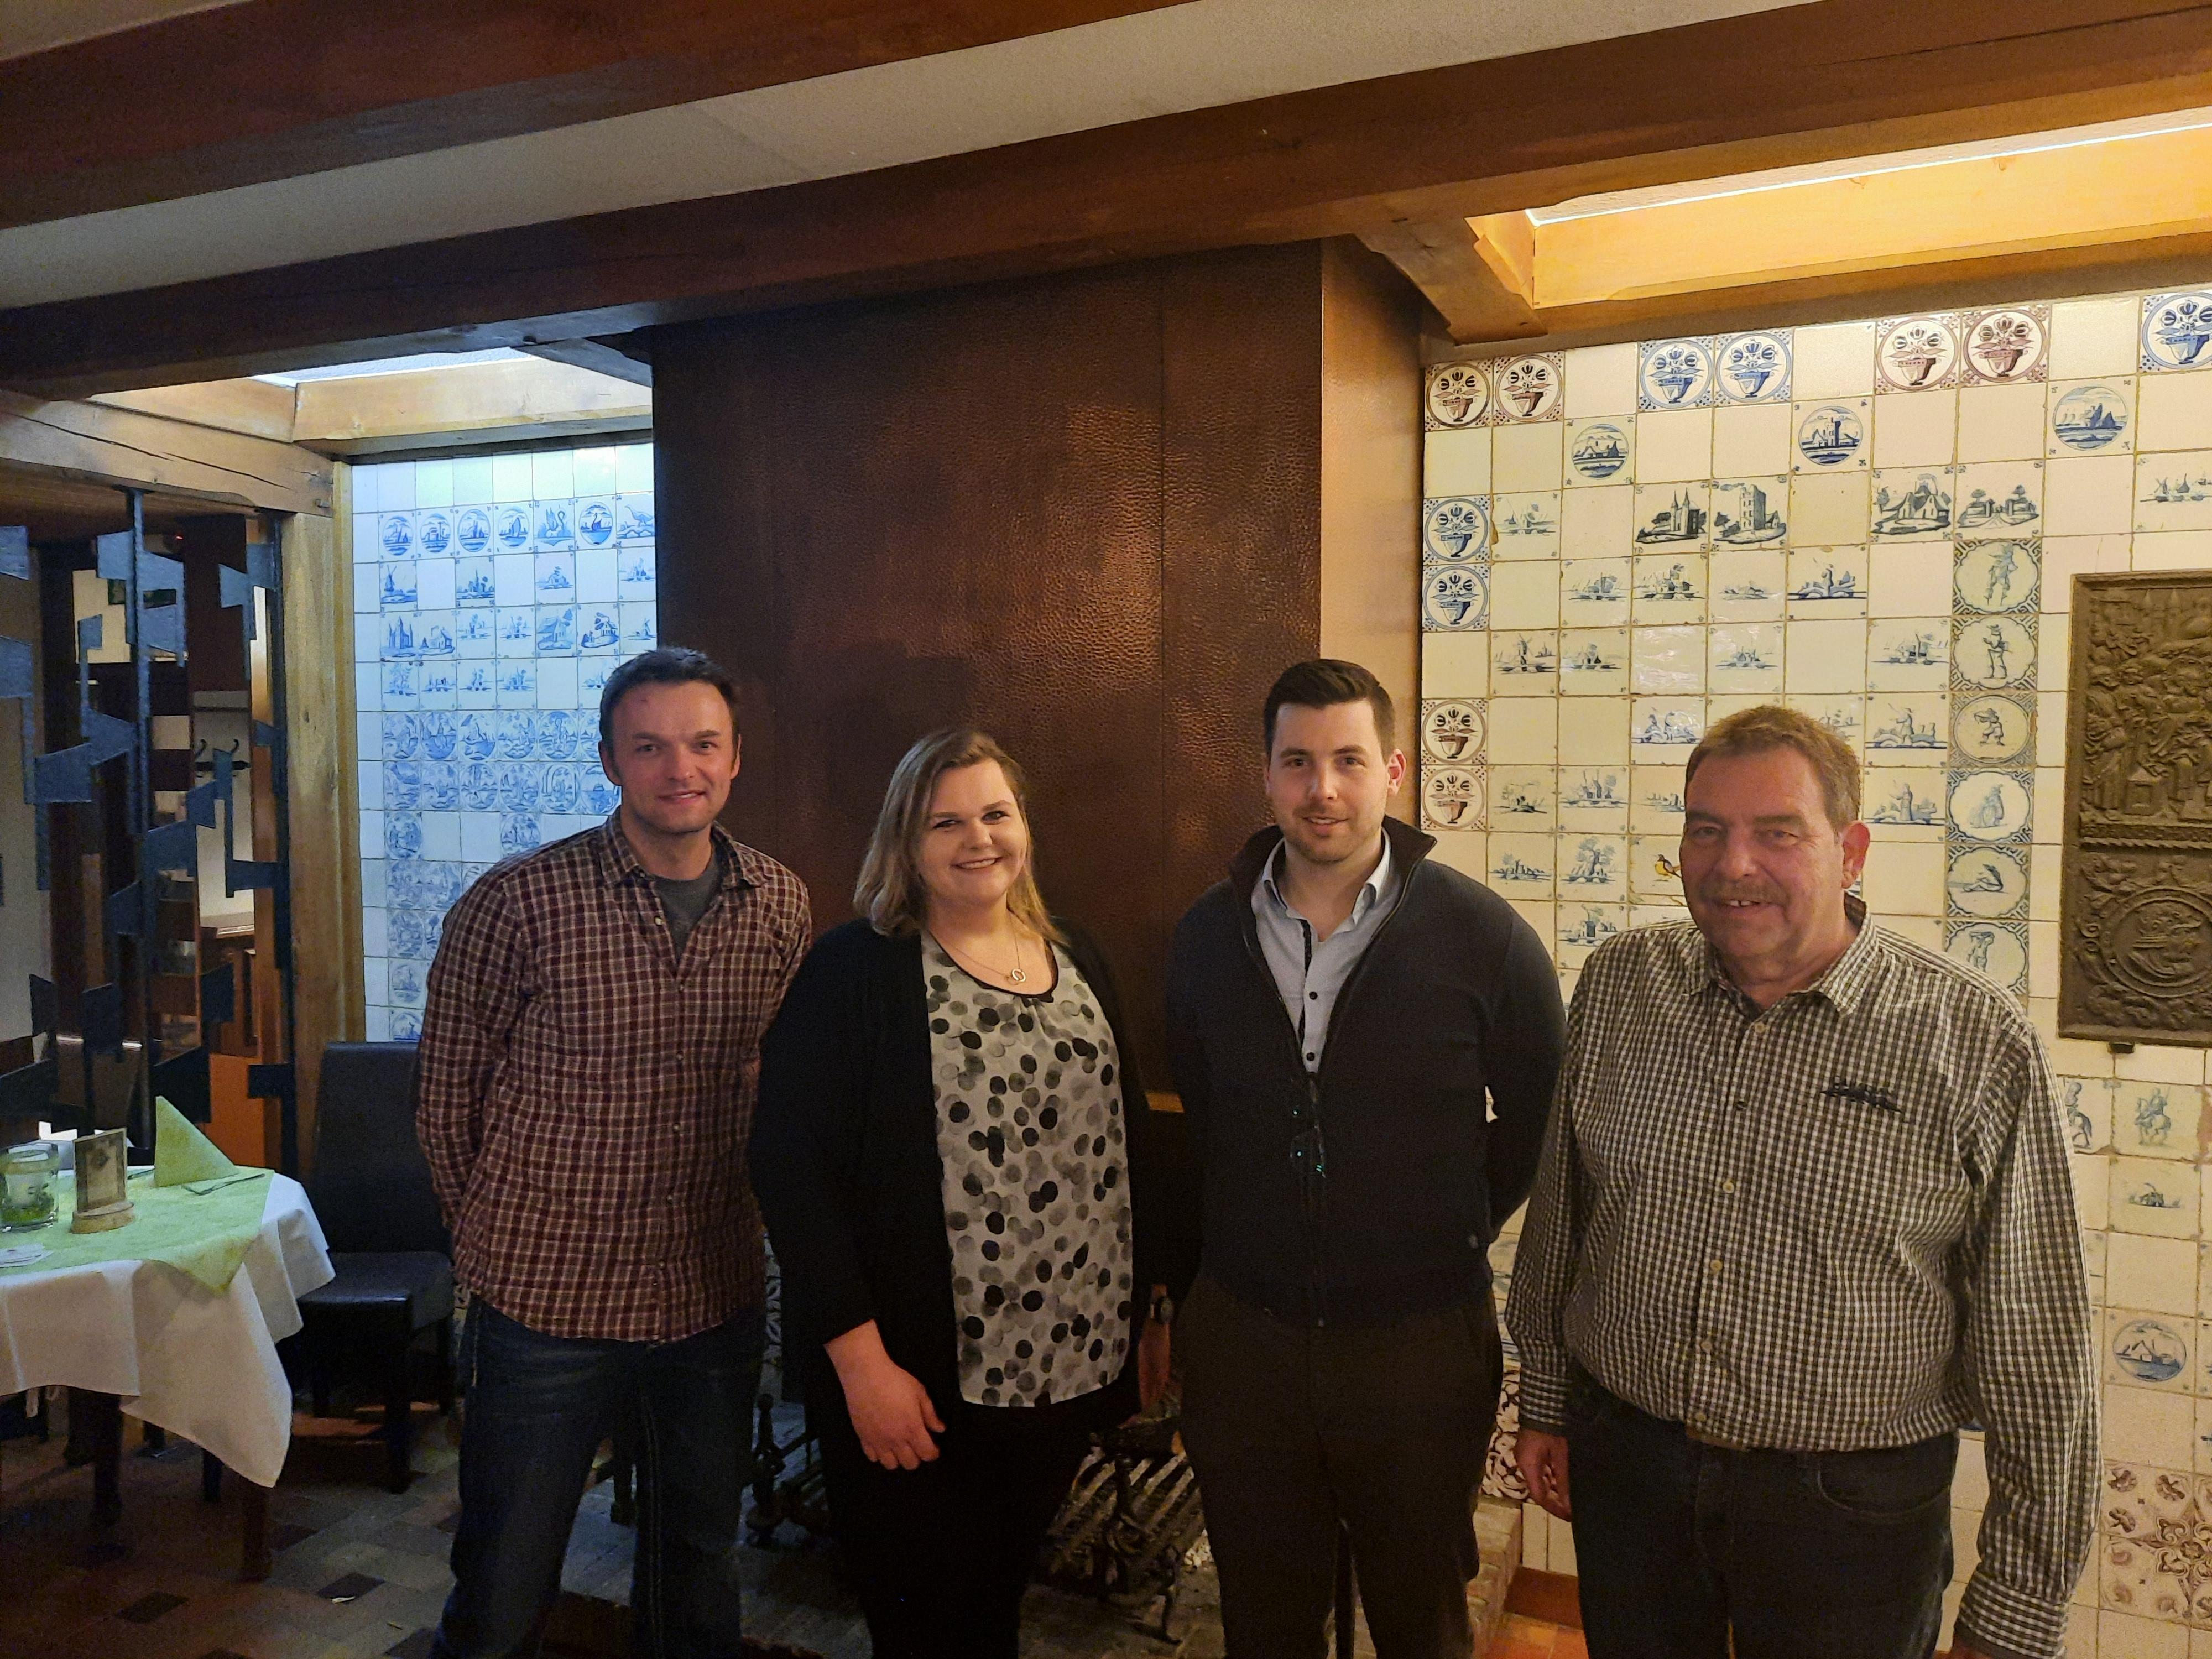 von Links: Hendrik T., Norbert B., Karsten H., Ursel A.